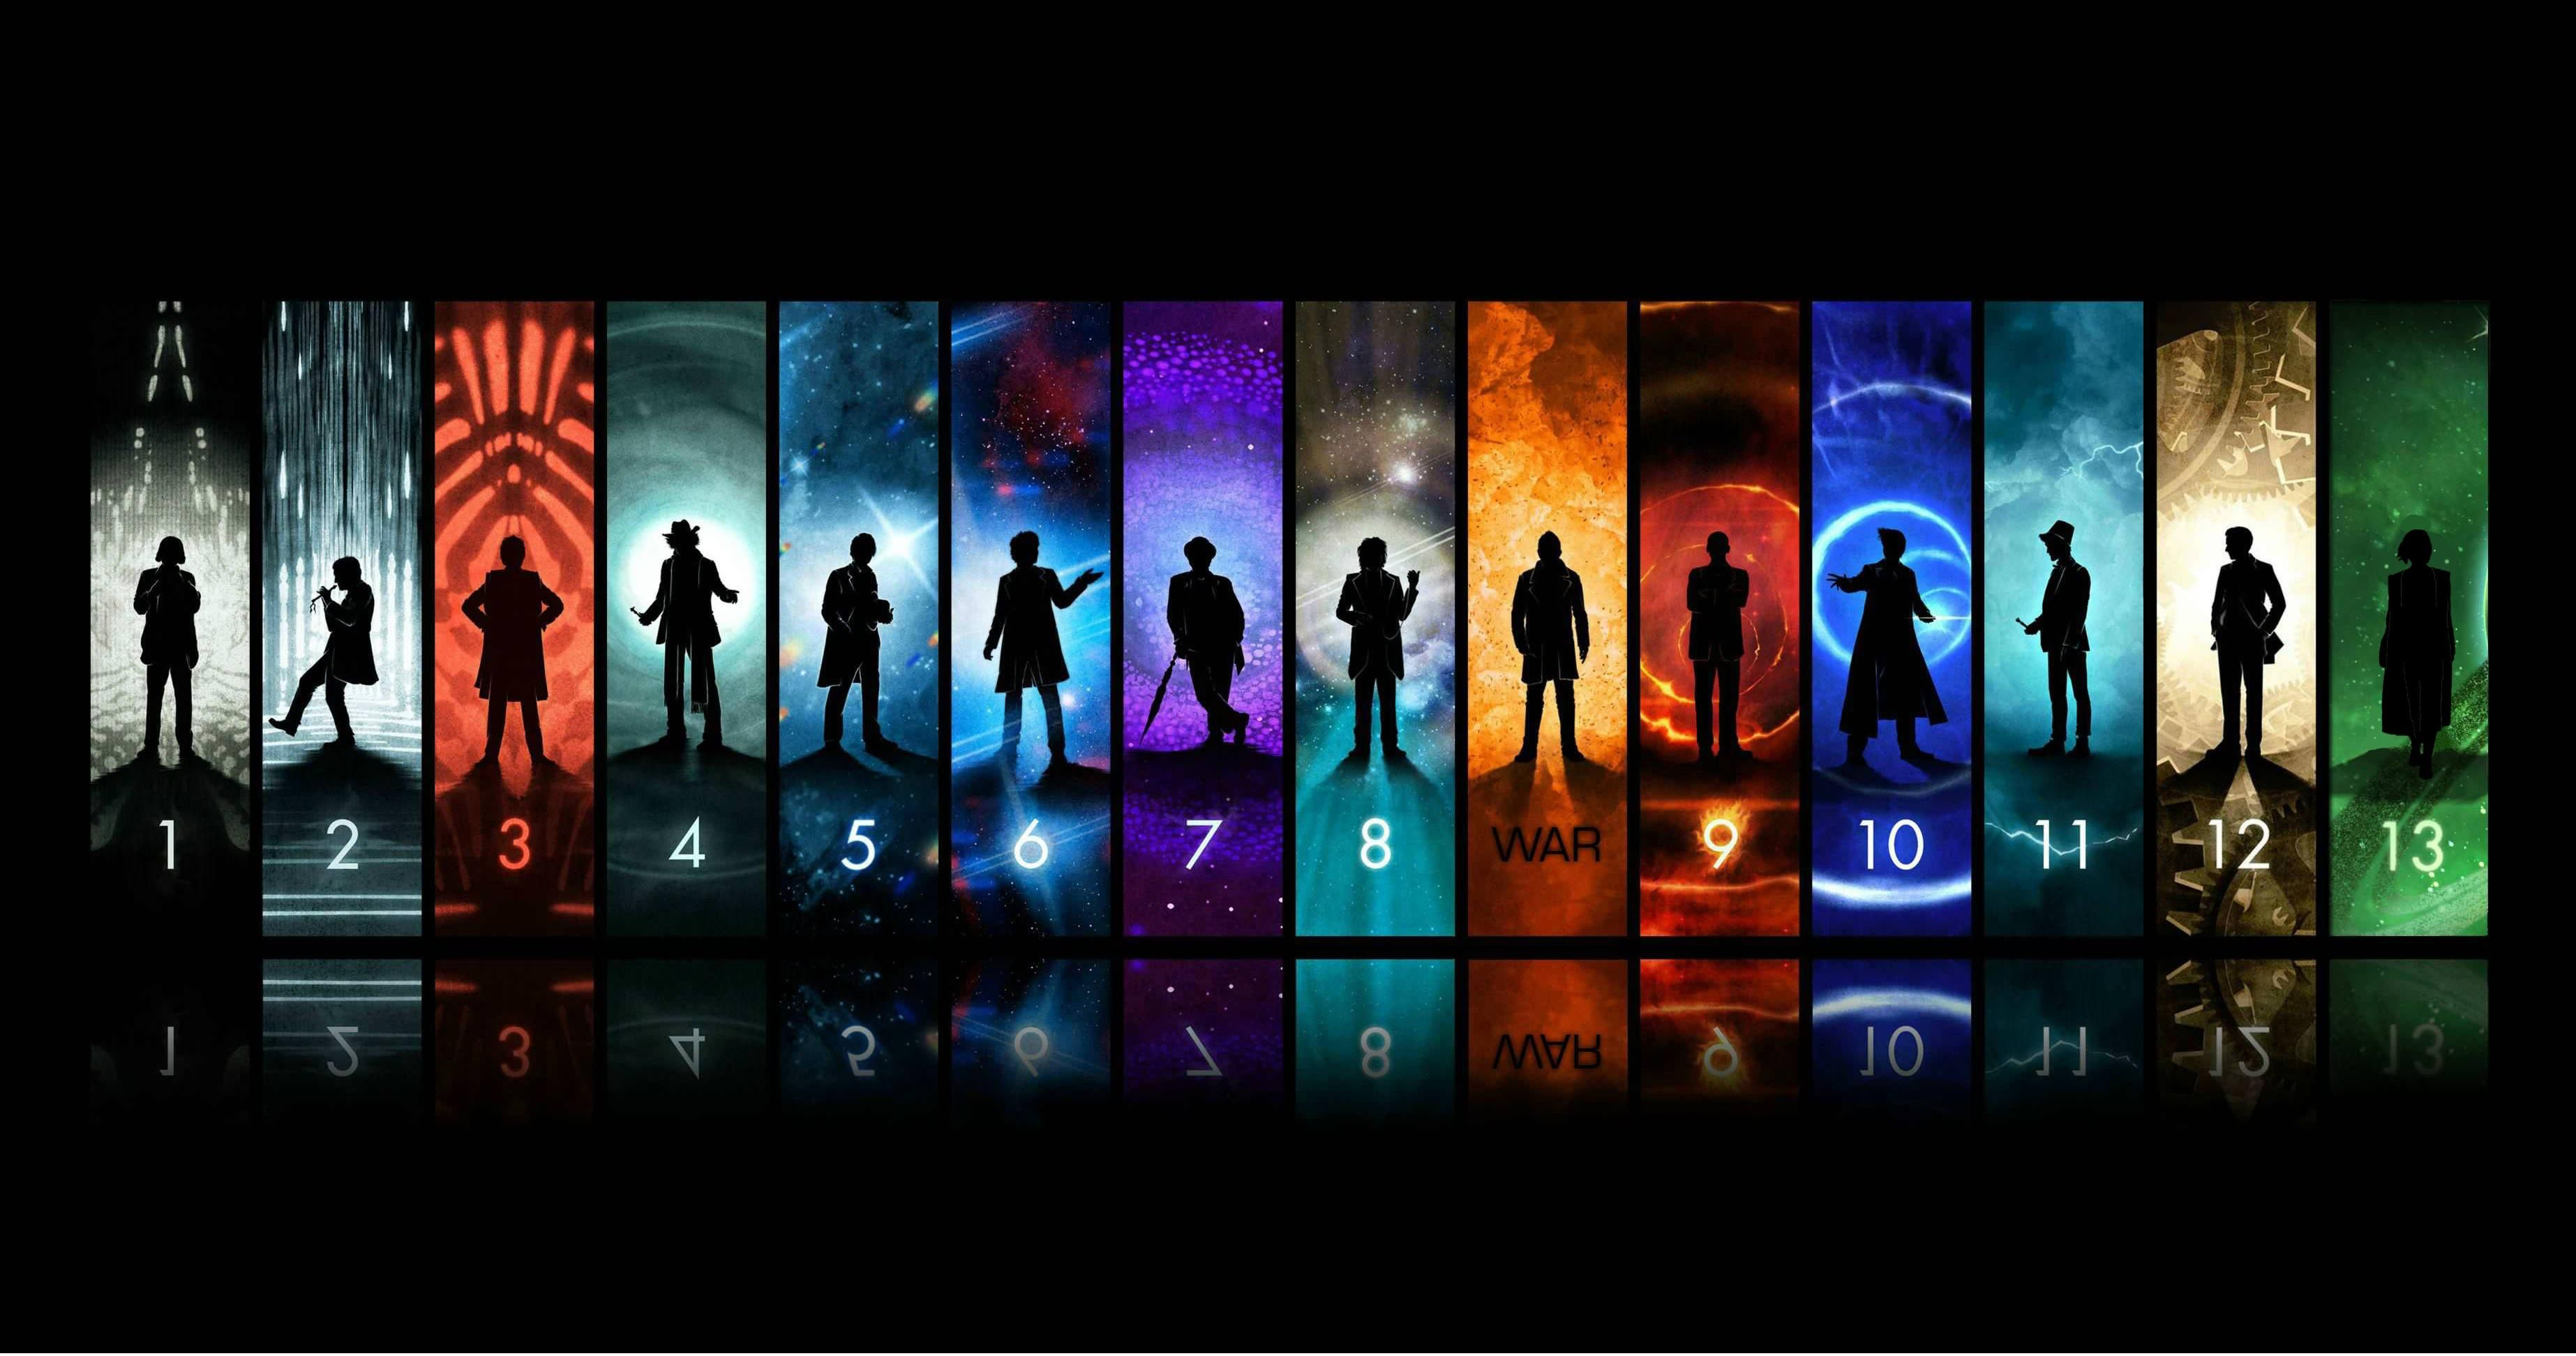 14 Doctors Wallpaper Doctor who wallpaper, Doctor who